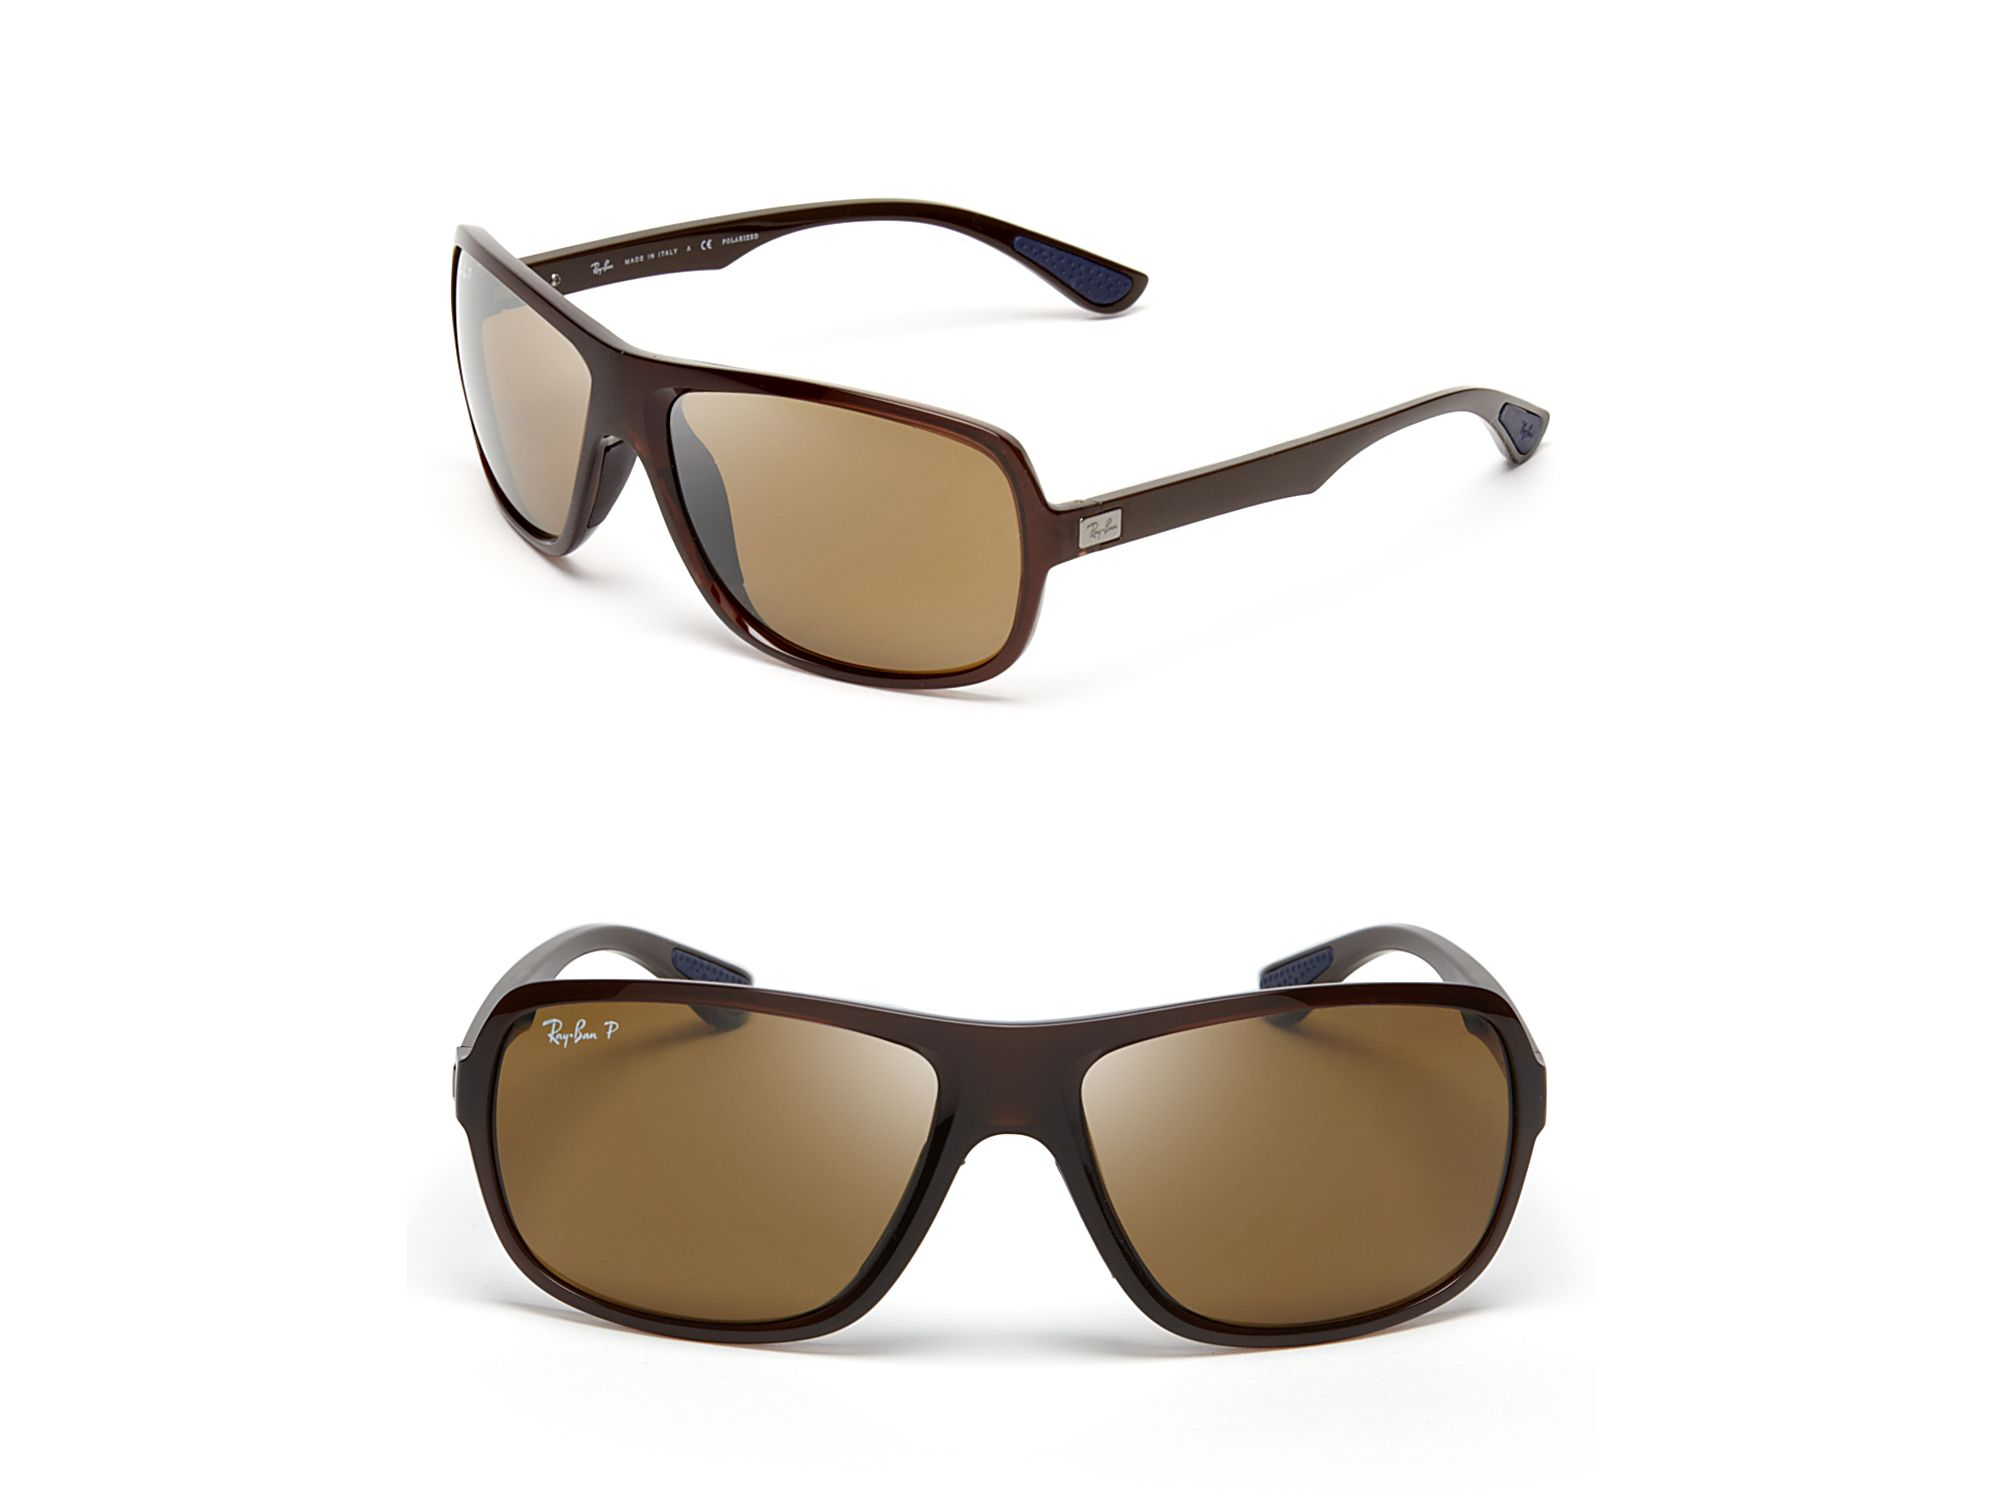 815f1c68f89 Ray Ban Shield Sunglasses Polarized « Heritage Malta